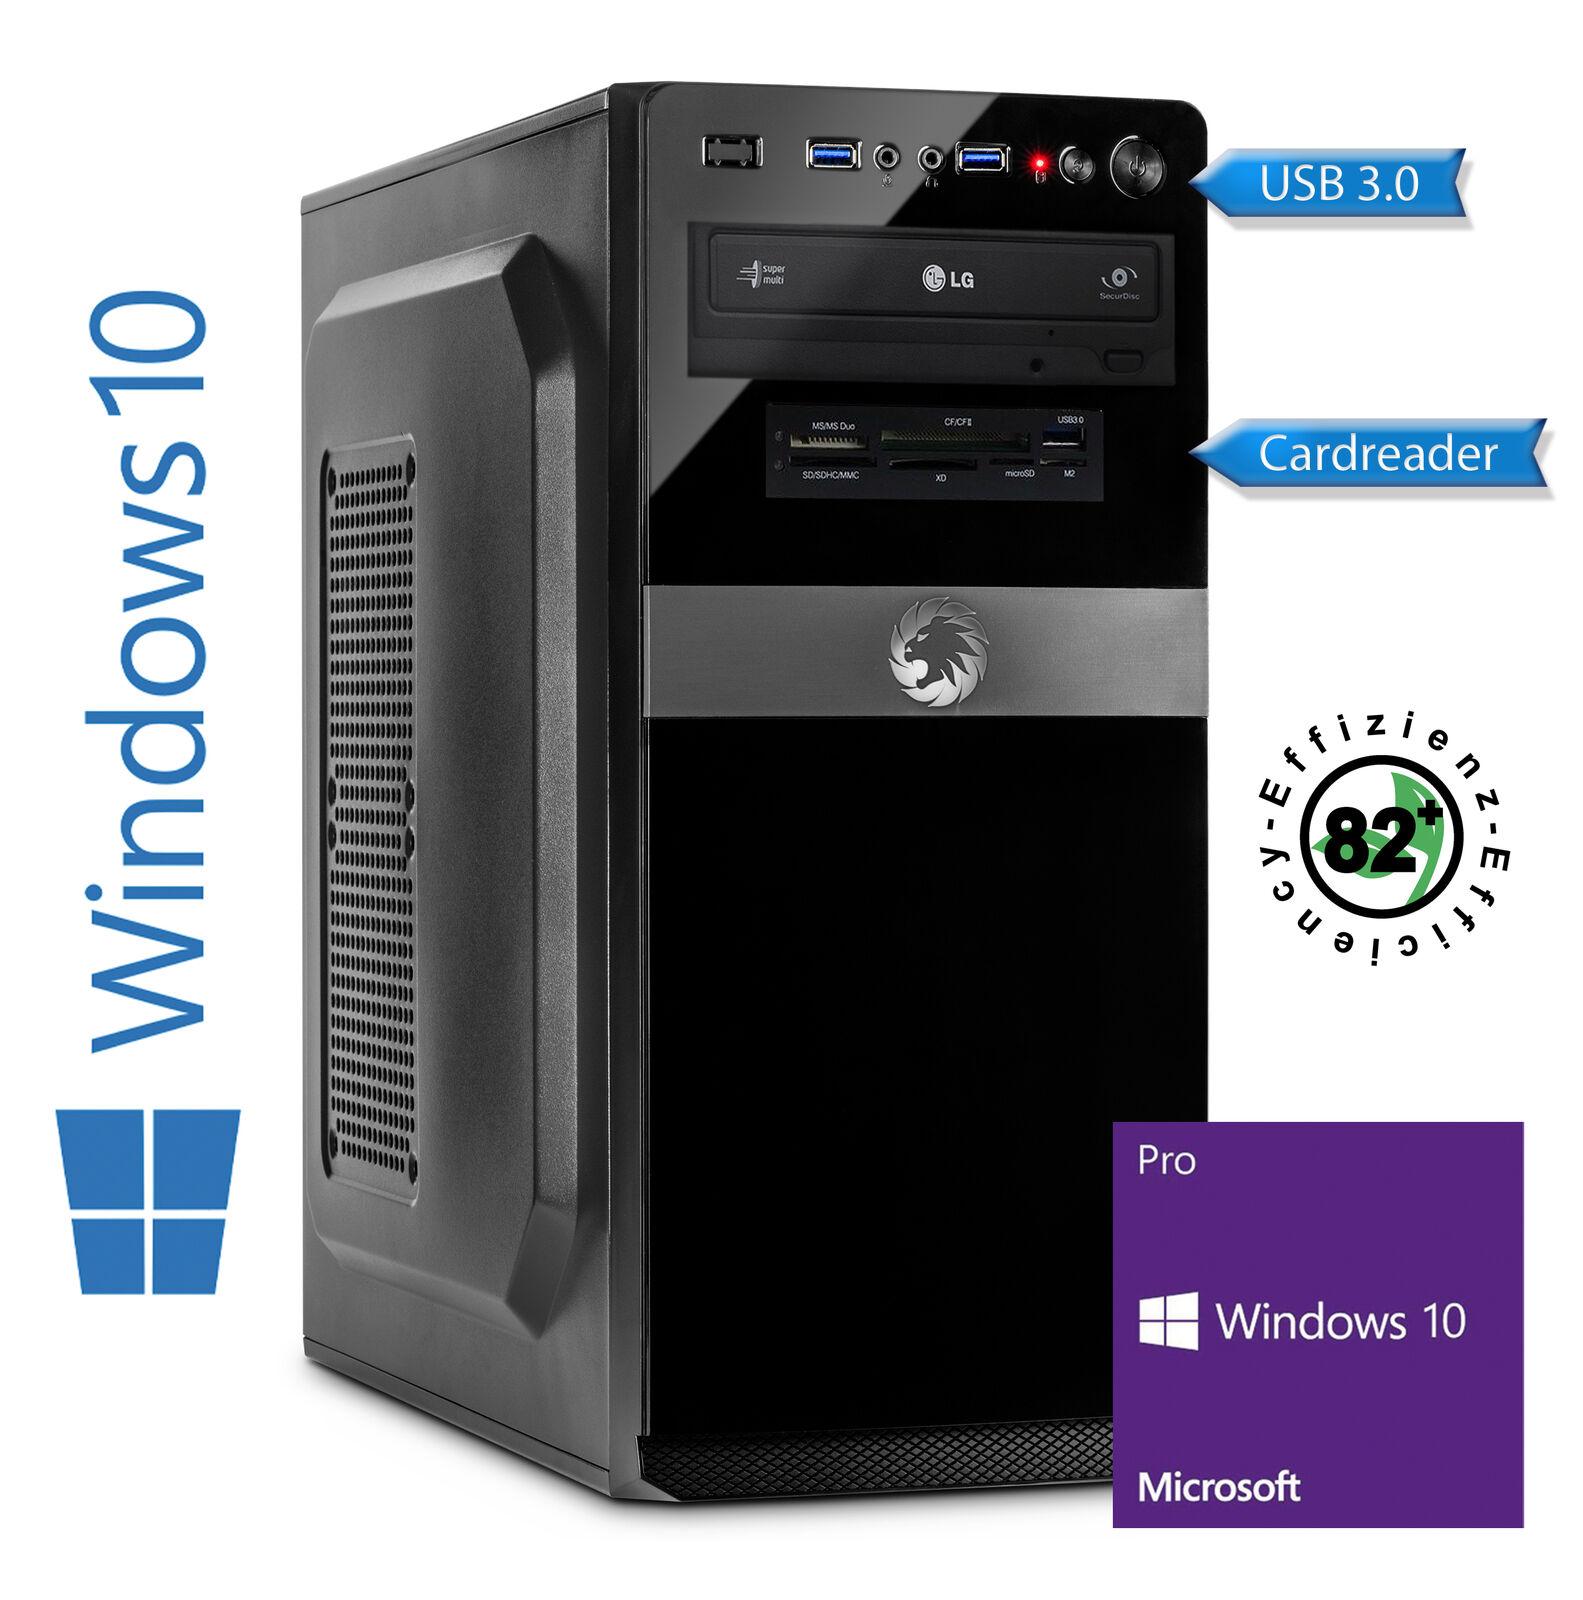 Desktop PC - Intel i5-8400 6x 2.8 GHz, 8GB DDR4 RAM, 240 GB SSD Windows 10 Pro